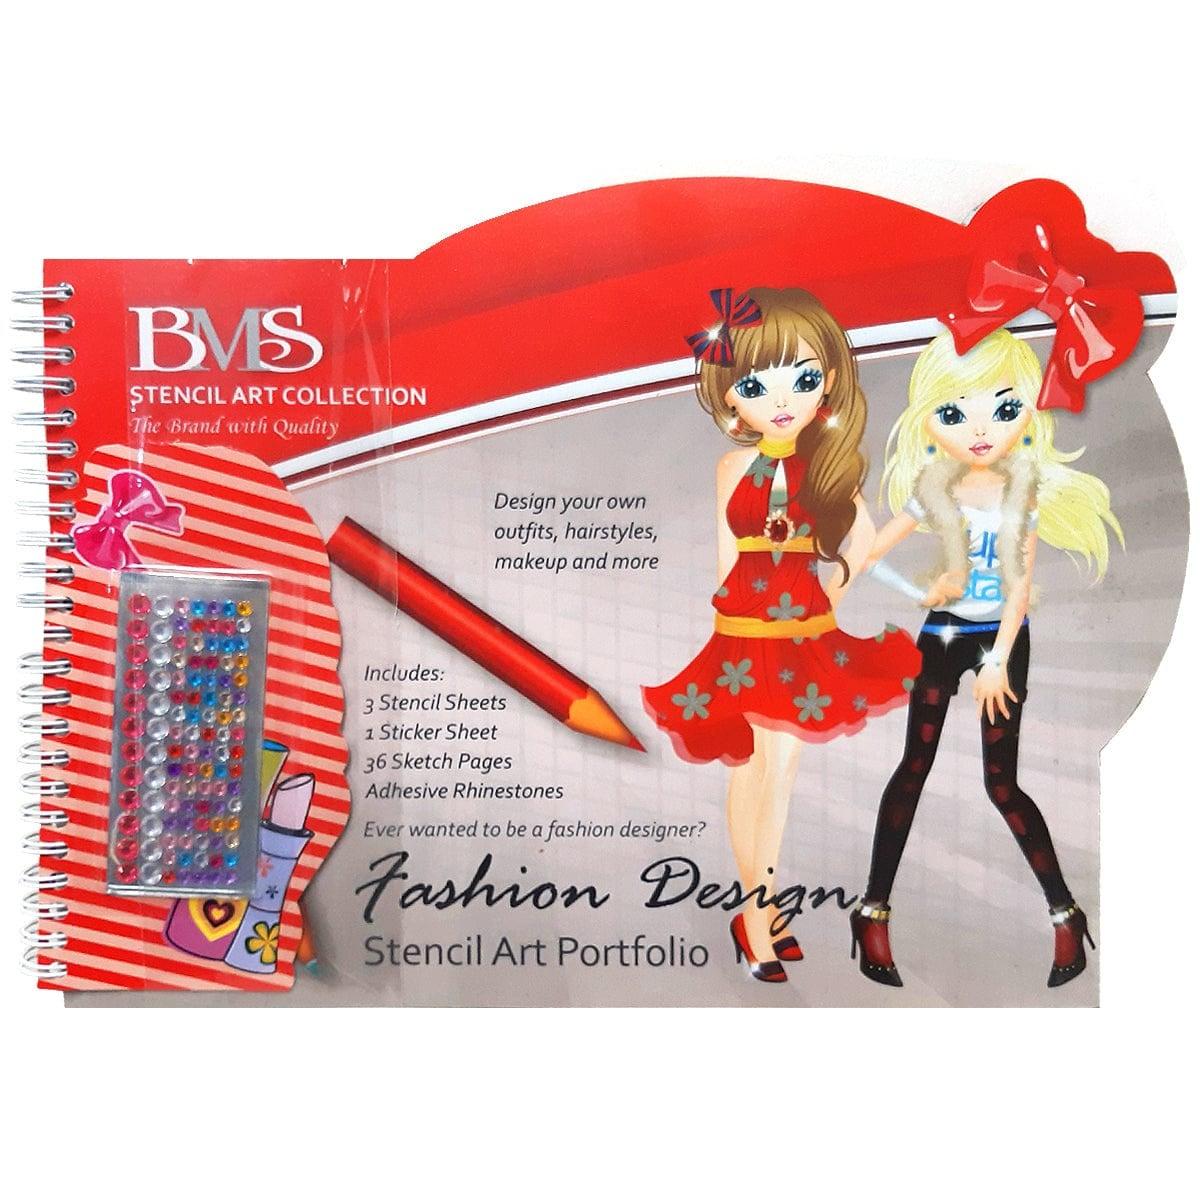 Fashion Design Folio With Pencils & Adhesive Appliques